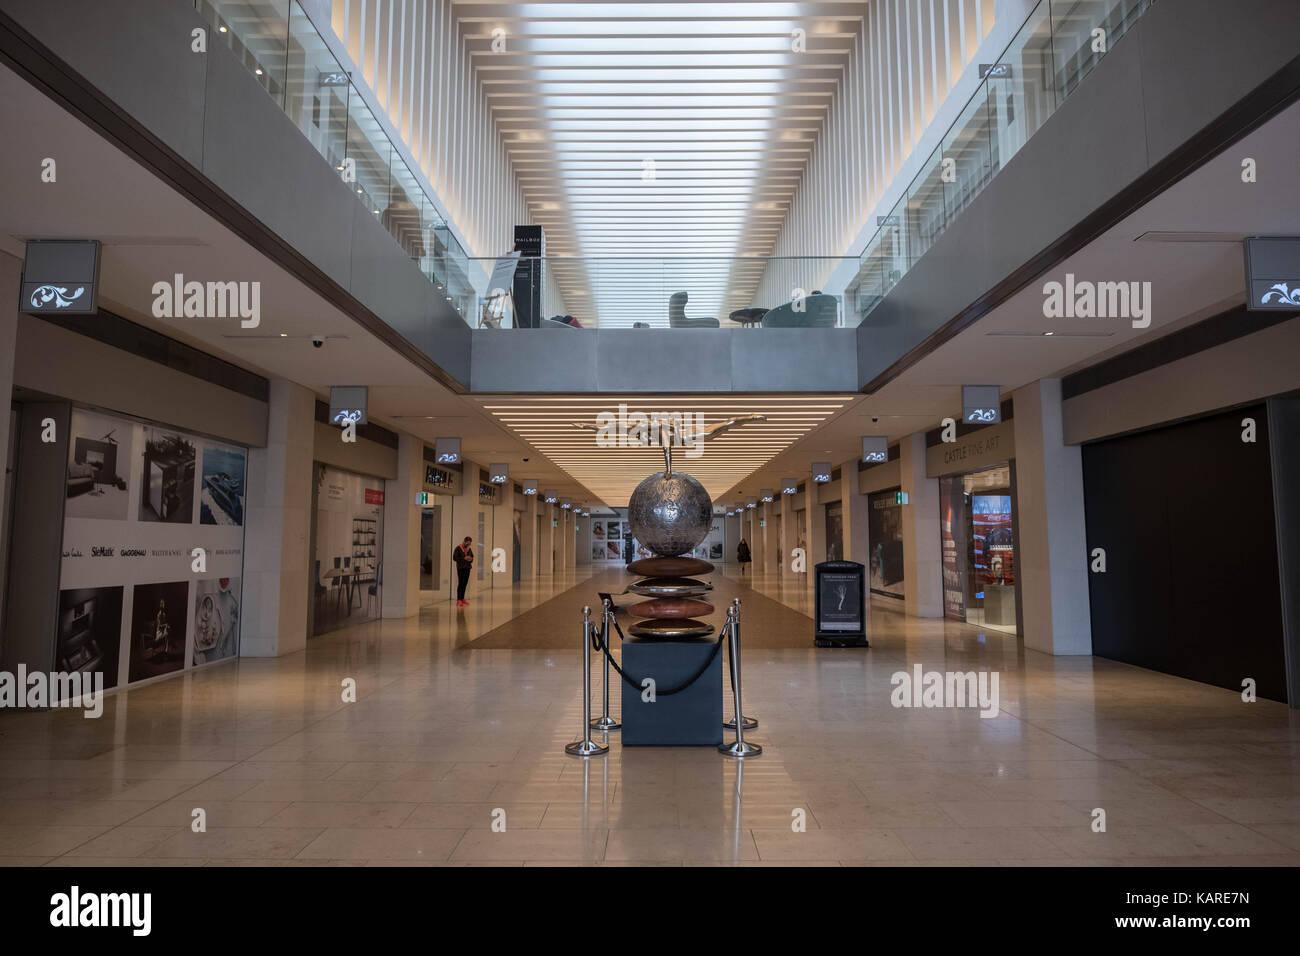 Interior of the Mailbox Birmingham city centre Stock Photo